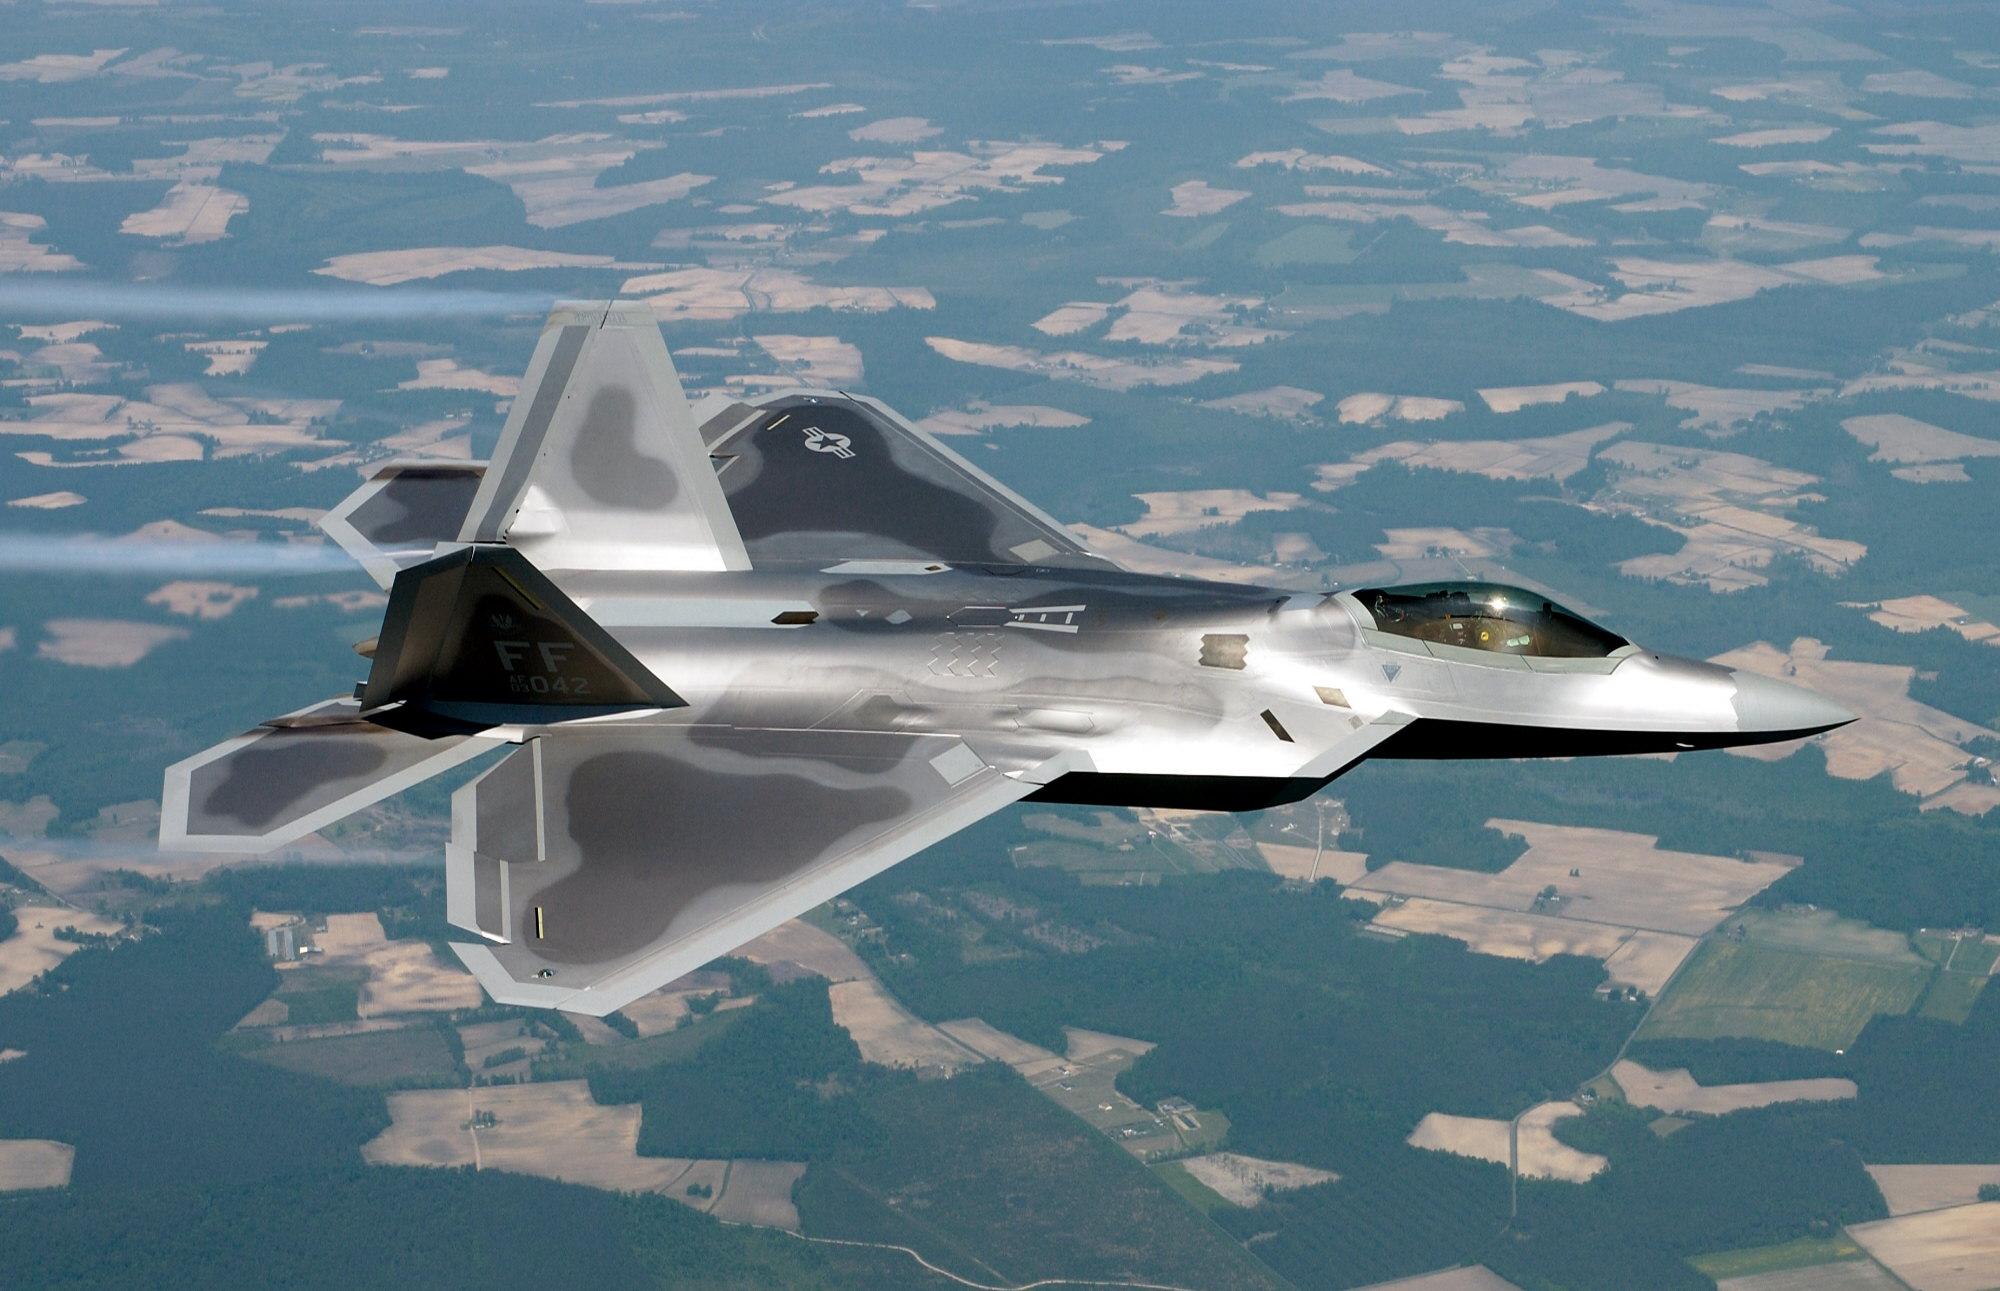 F-22 Raptor - Page 2 050512-F-2295B-210